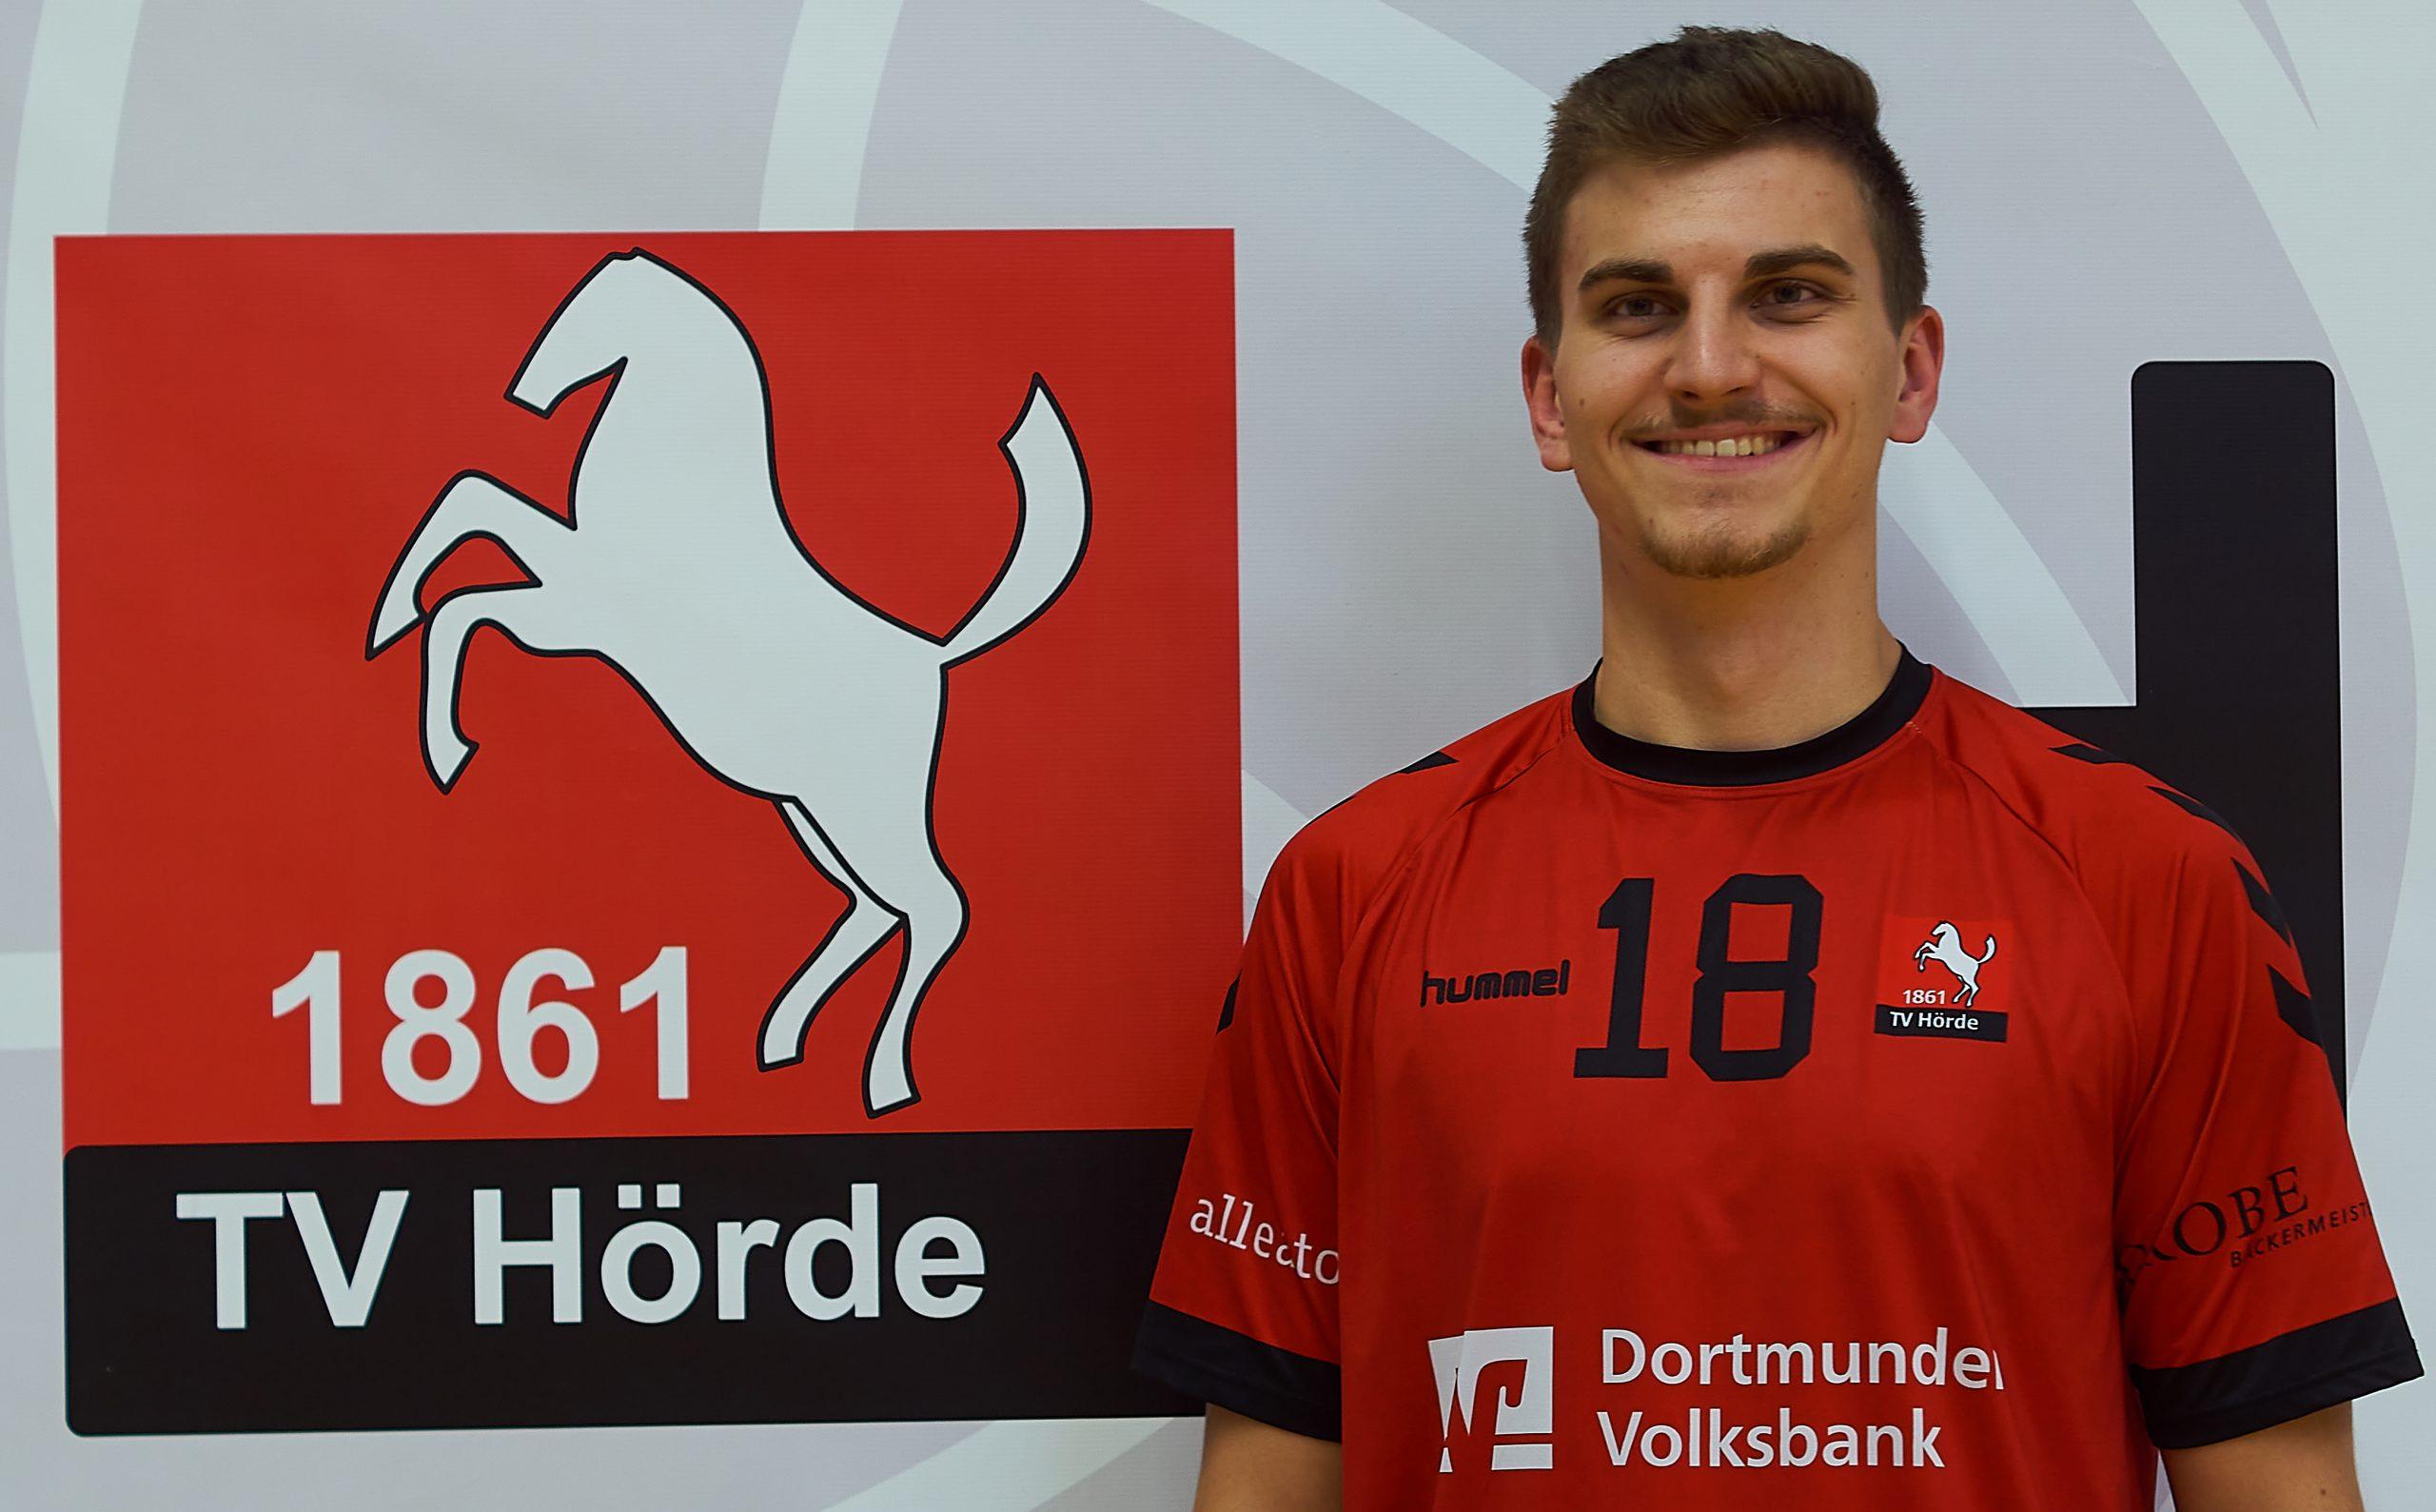 #18 Jan Pieper